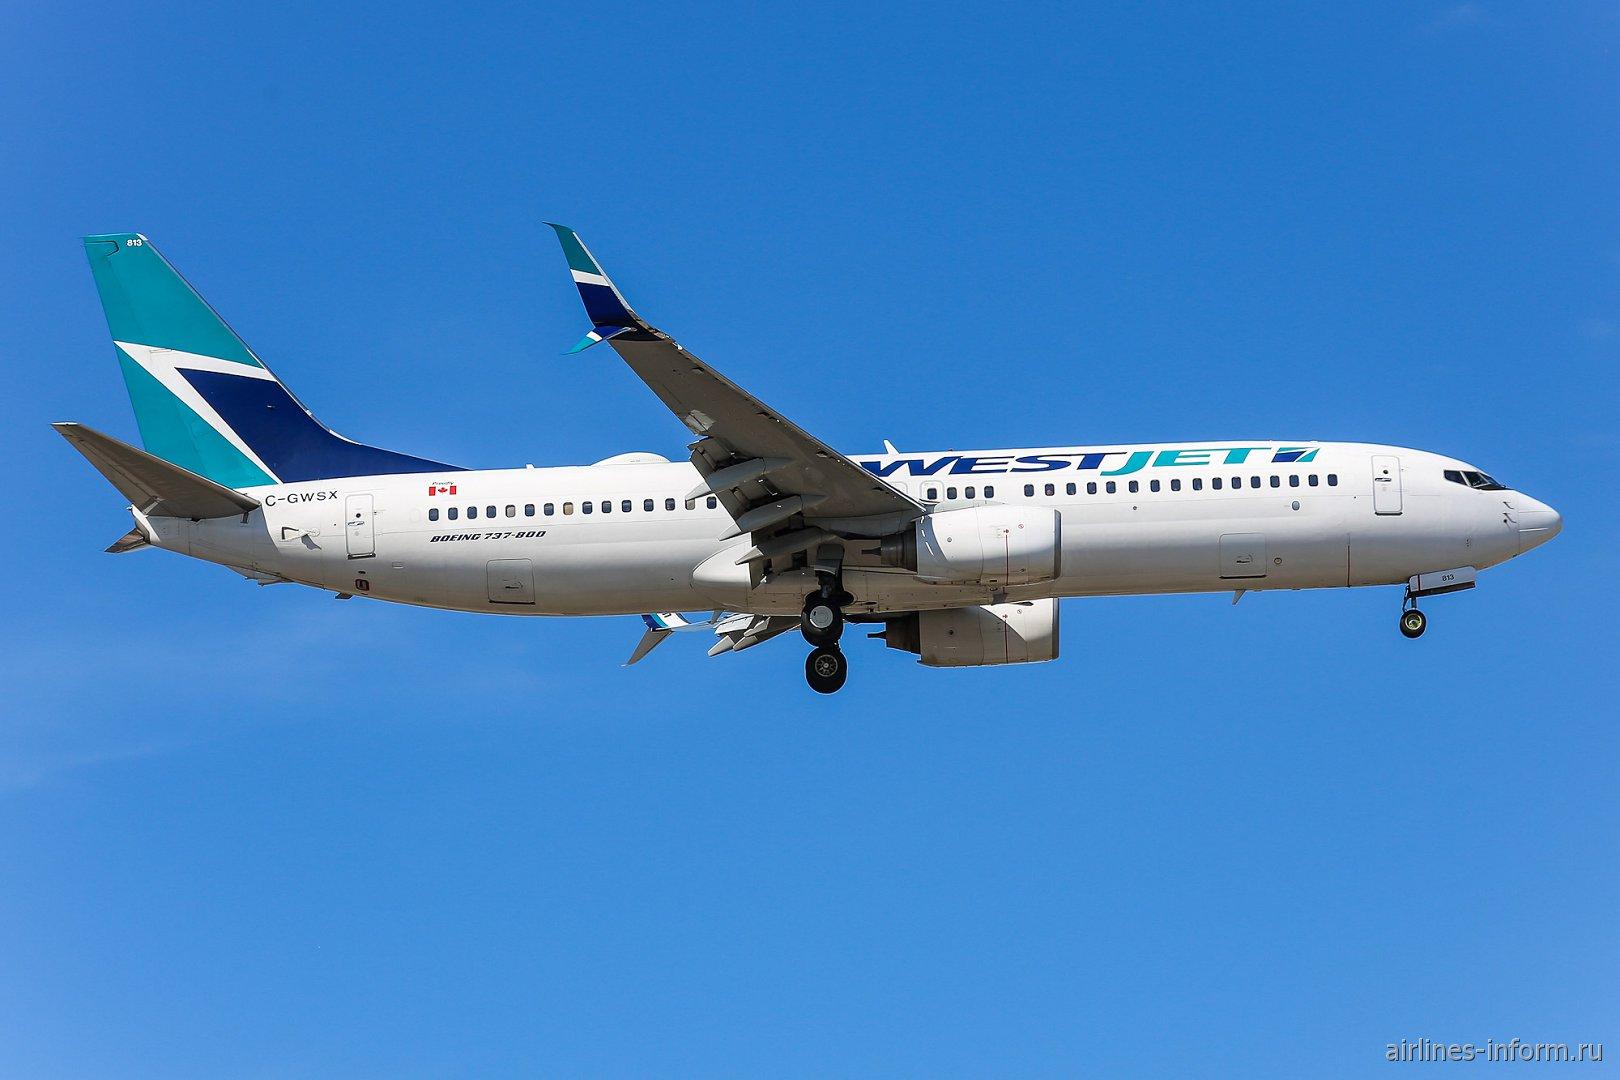 Boeing 737-800 C-GWSX авиакомпании WestJet